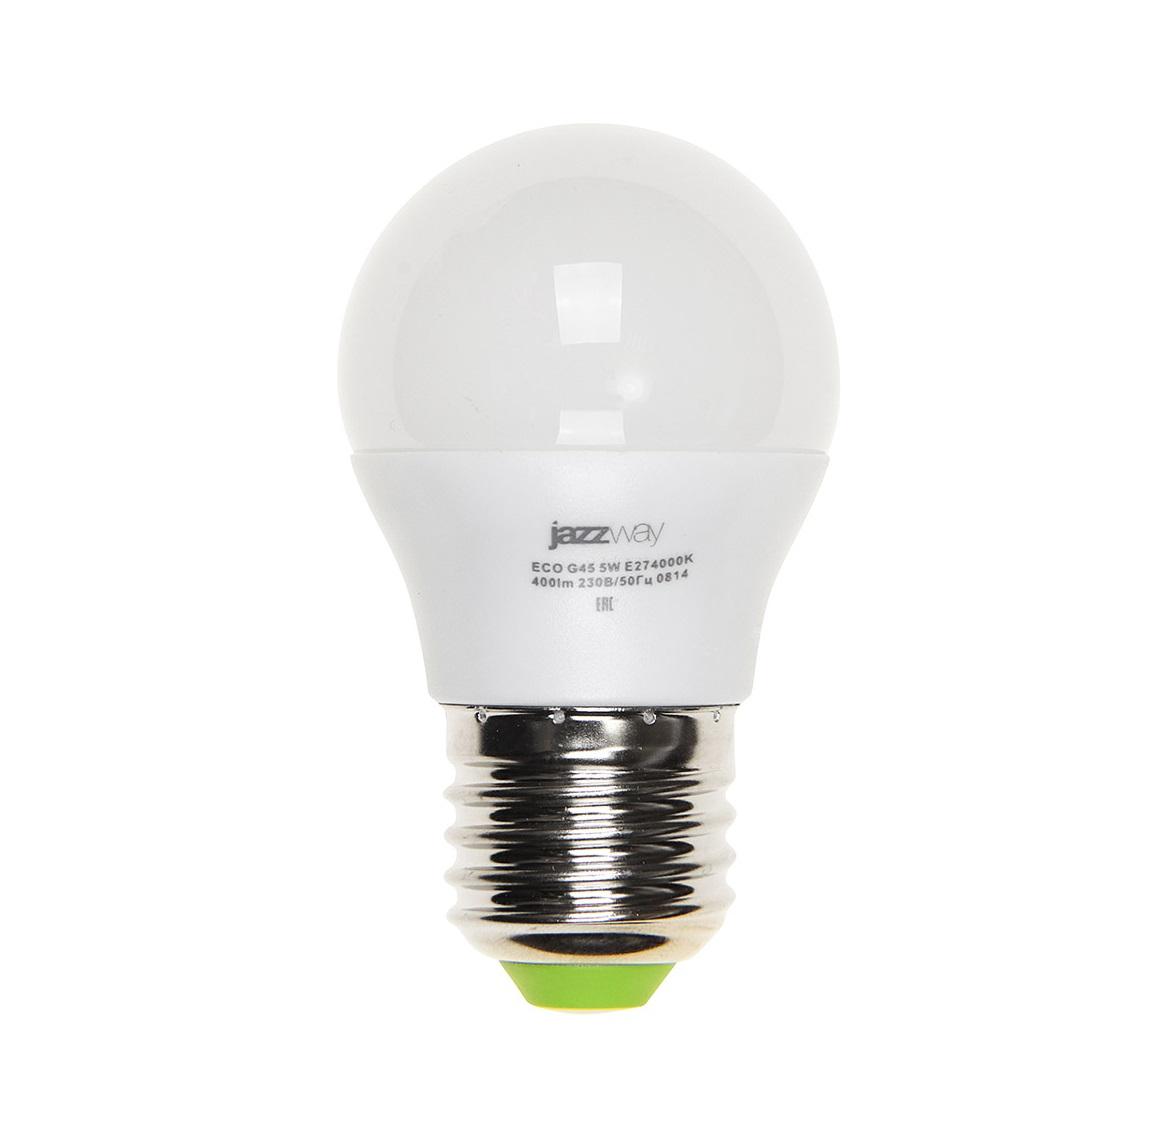 Лампа светодиодная Jazzway Pled-eco-g45 лампа настольная jazzway ptl 1128 blue